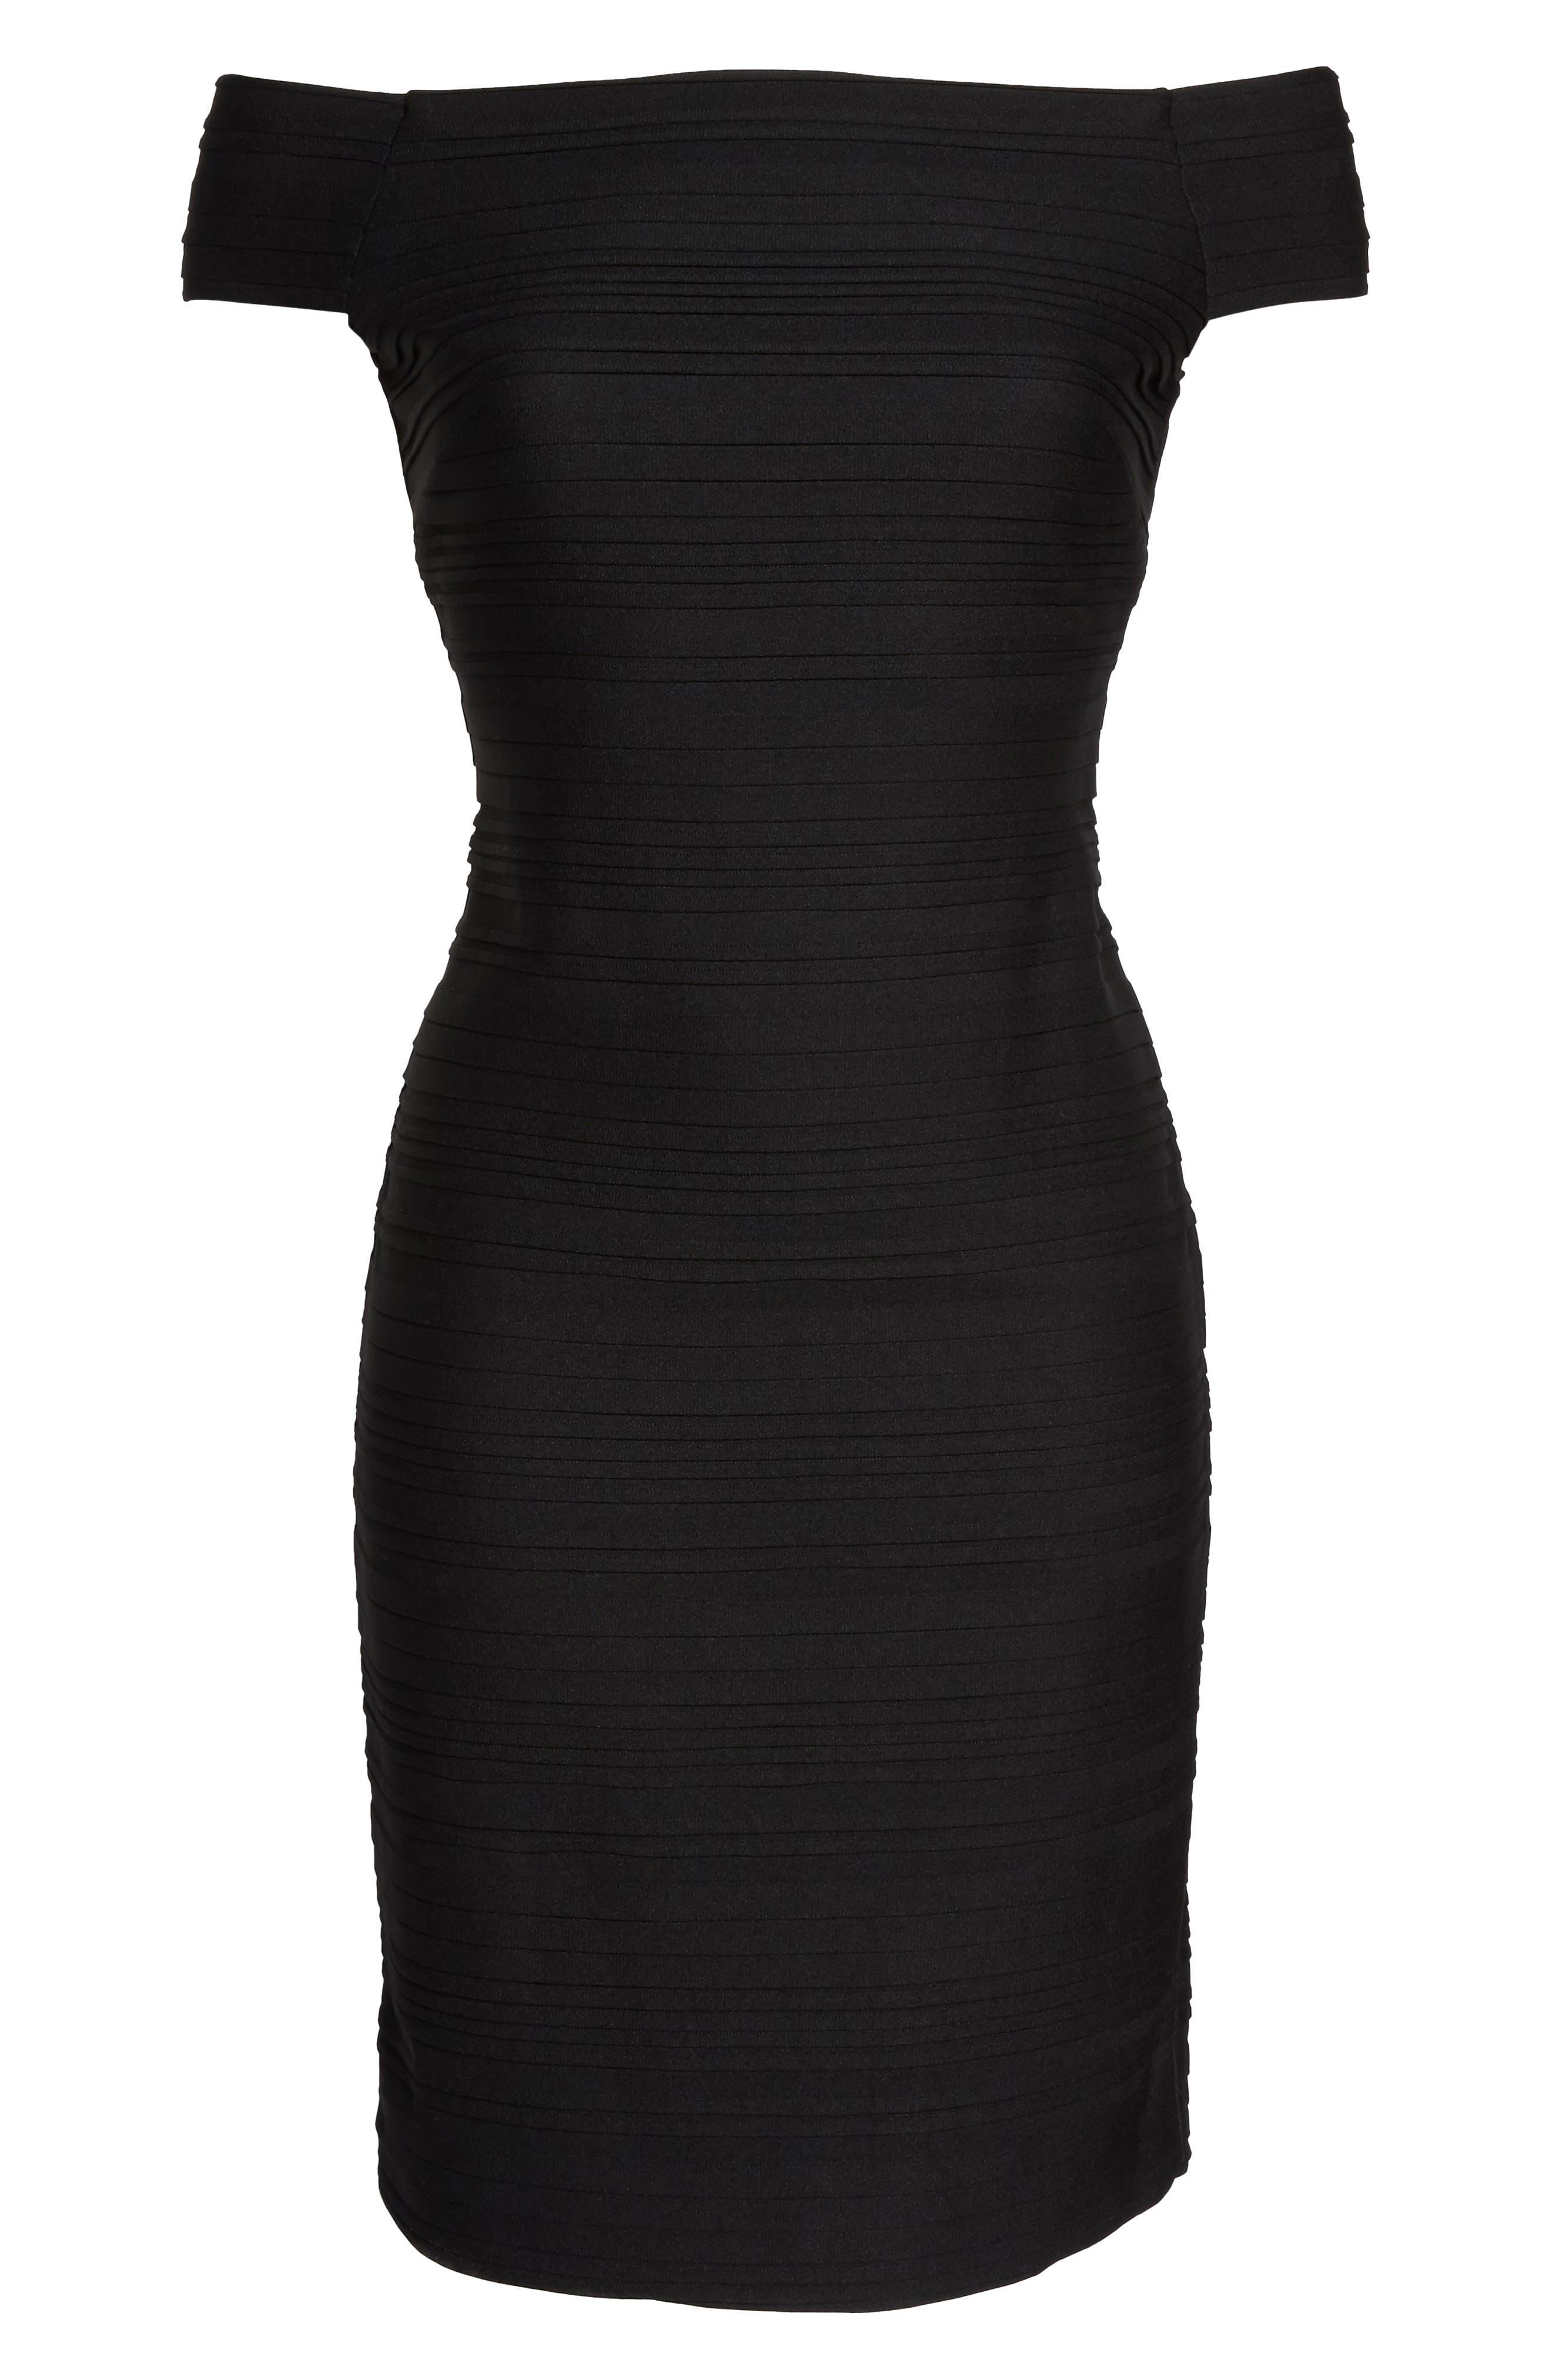 Off the Shoulder Sheath Dress,                             Alternate thumbnail 6, color,                             001